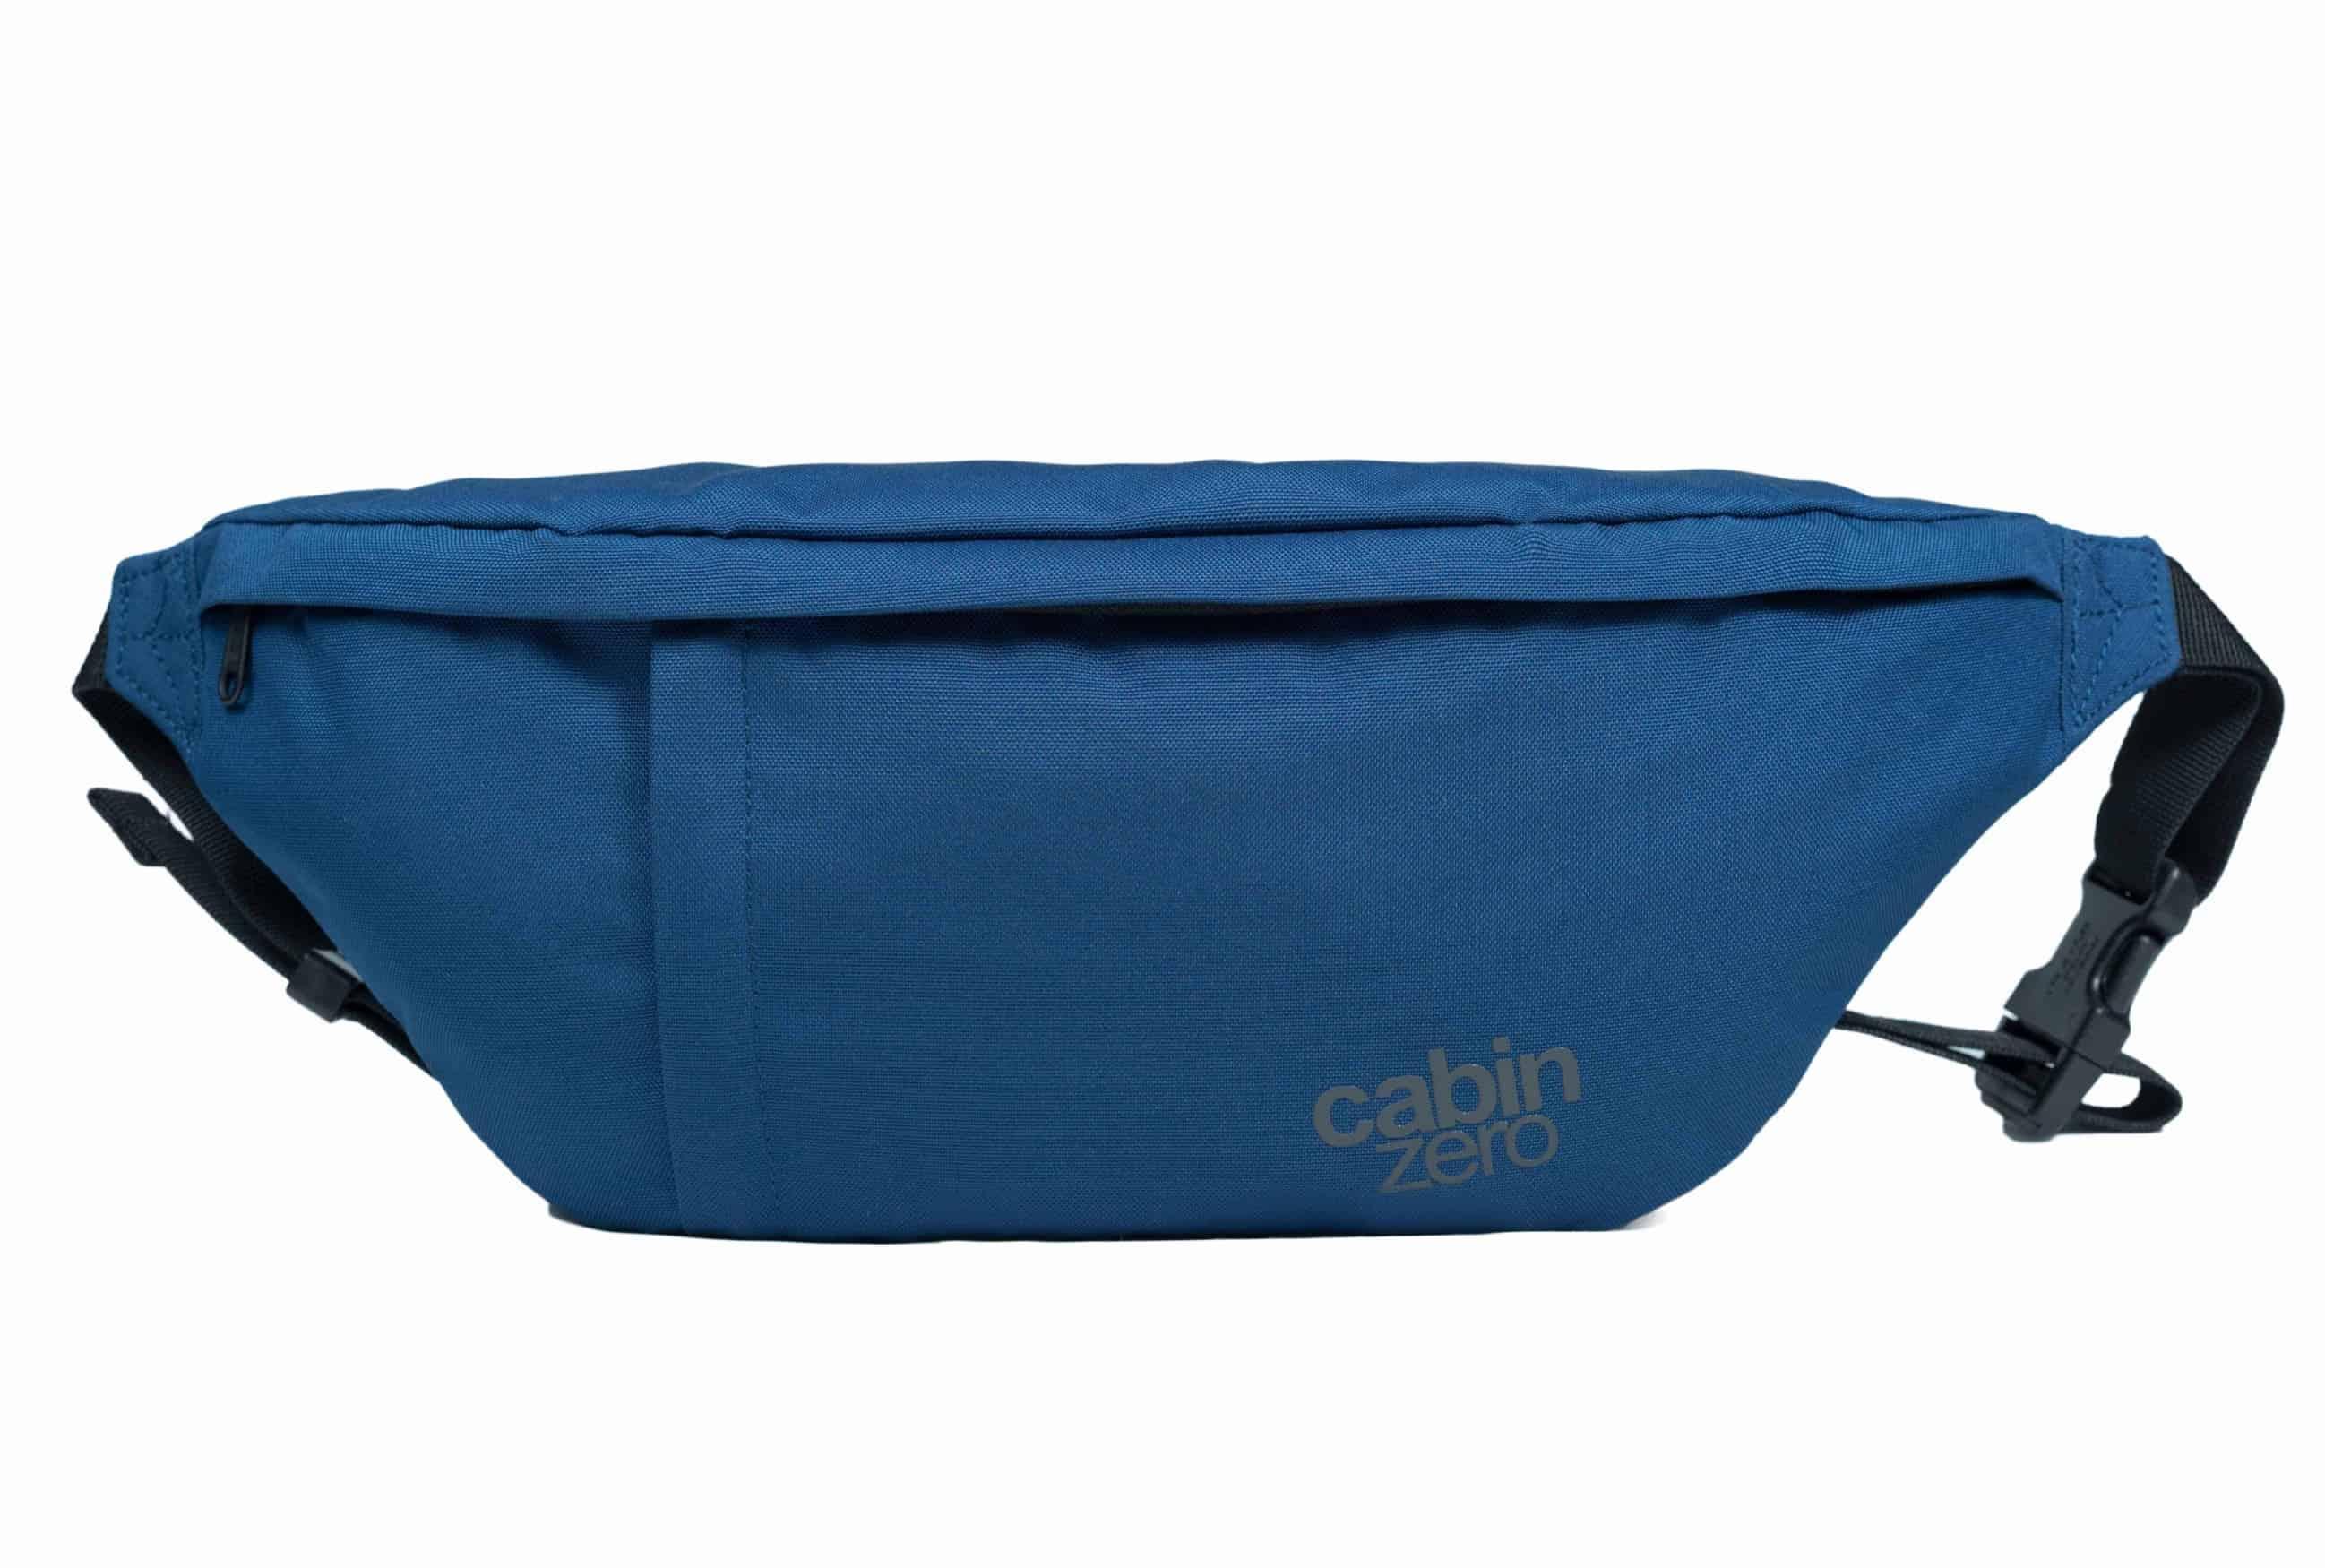 e794fb8de8 Buy Leather CabinZero Backpacks | Bags | Lazada.sg